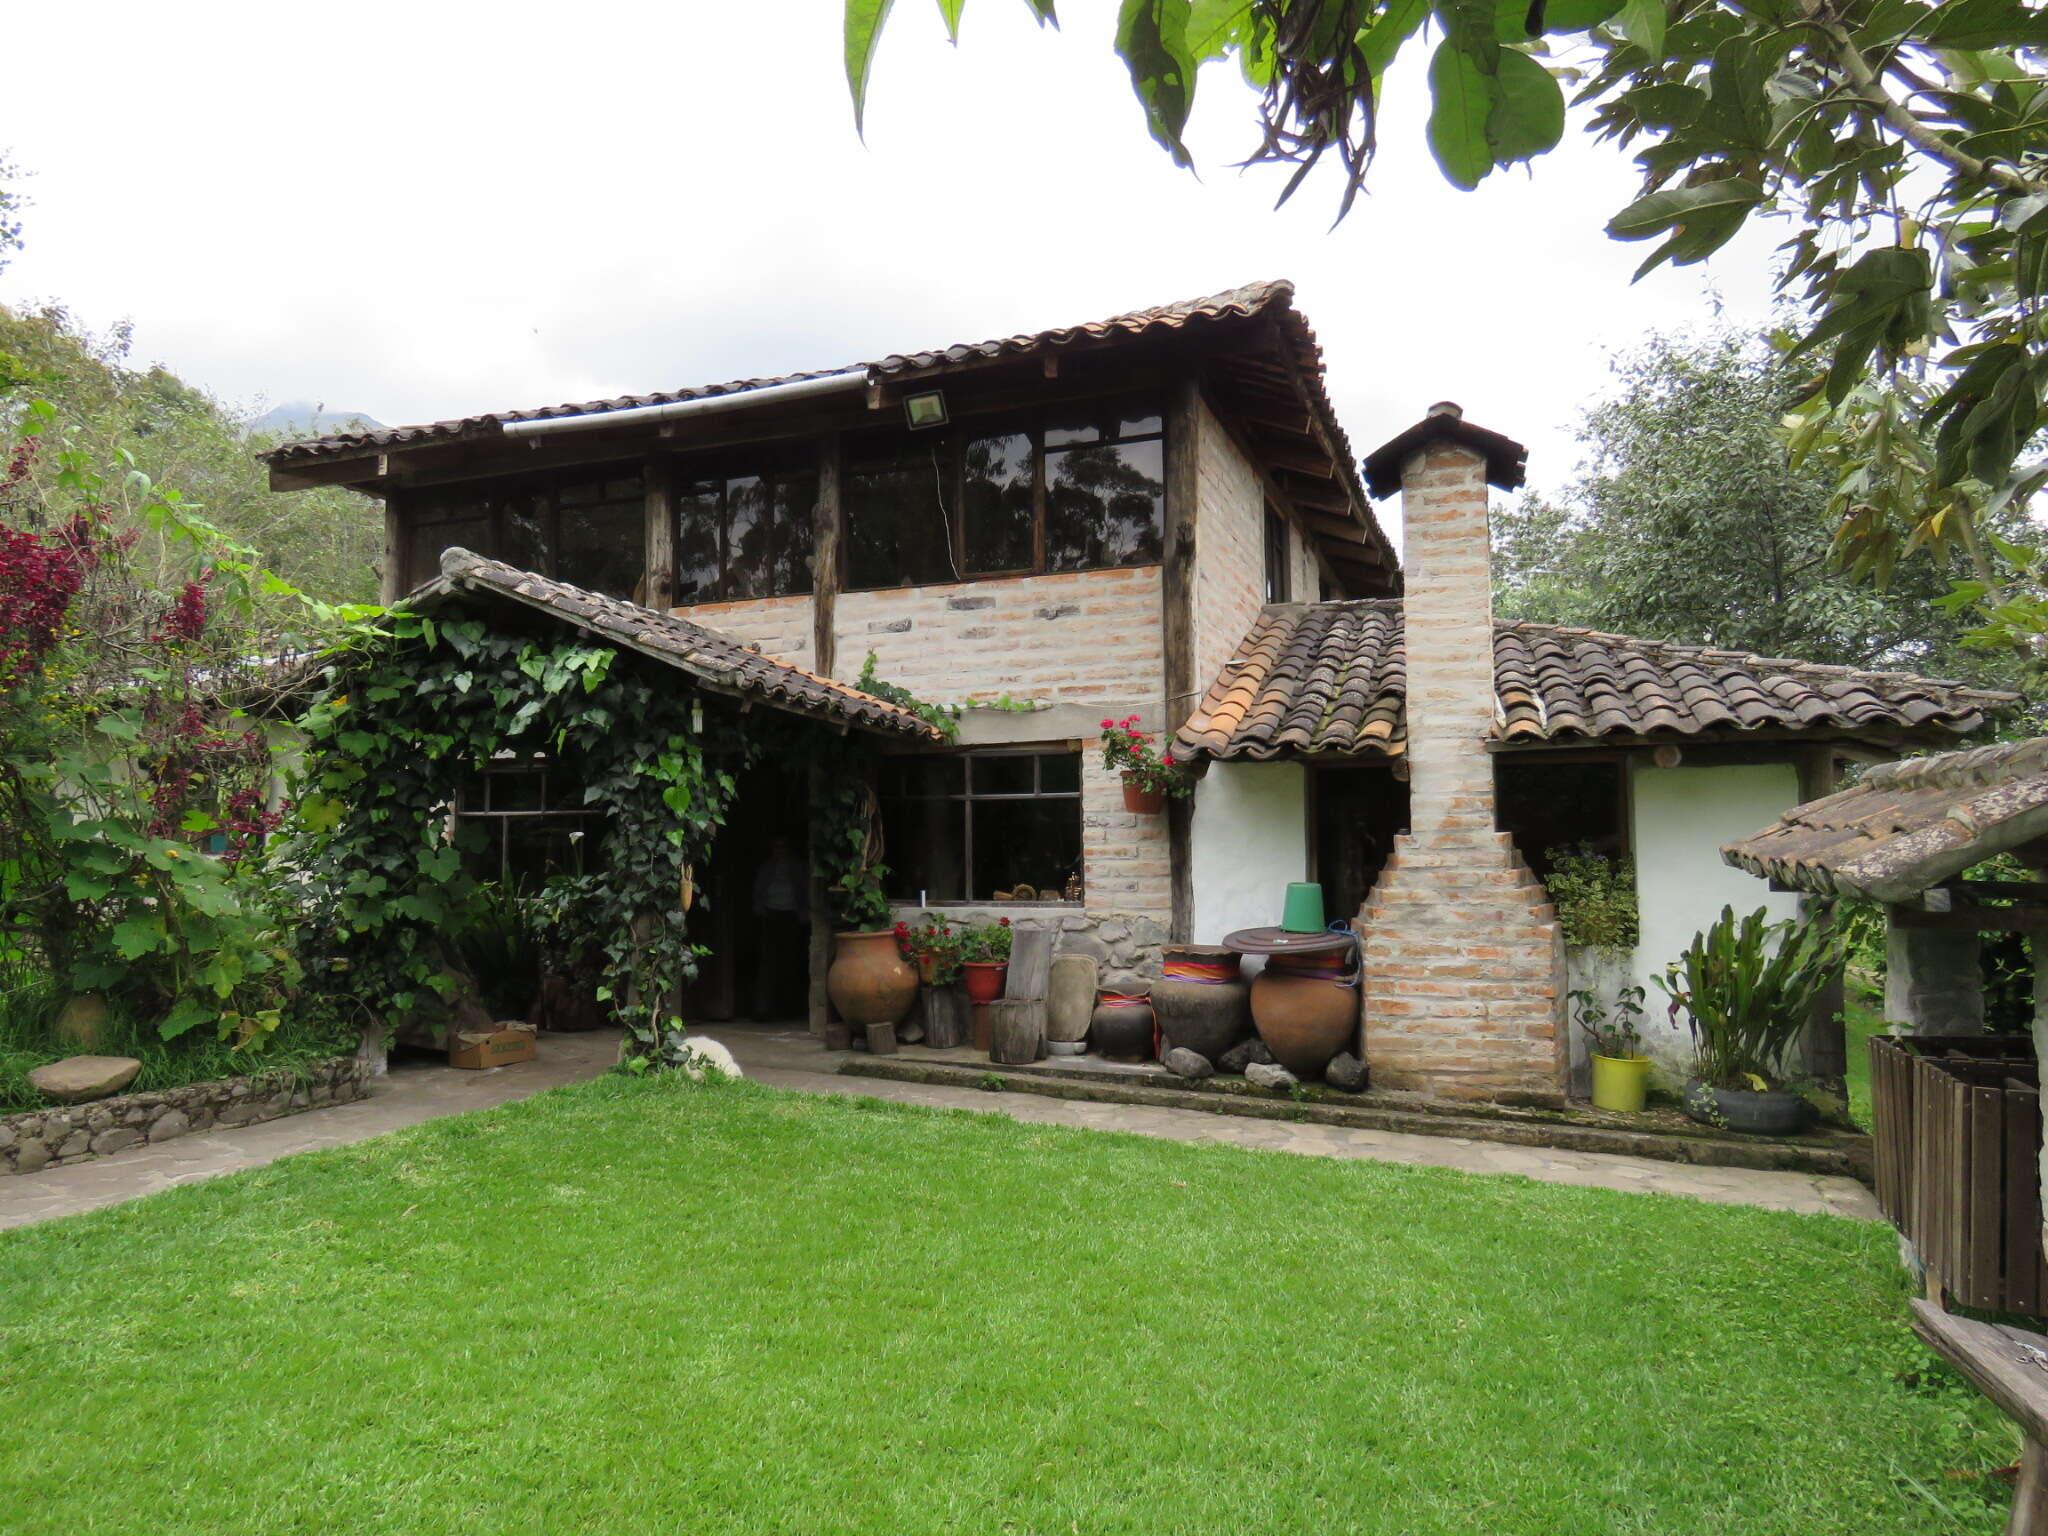 Otavalo – Hacienda Pinsaqui